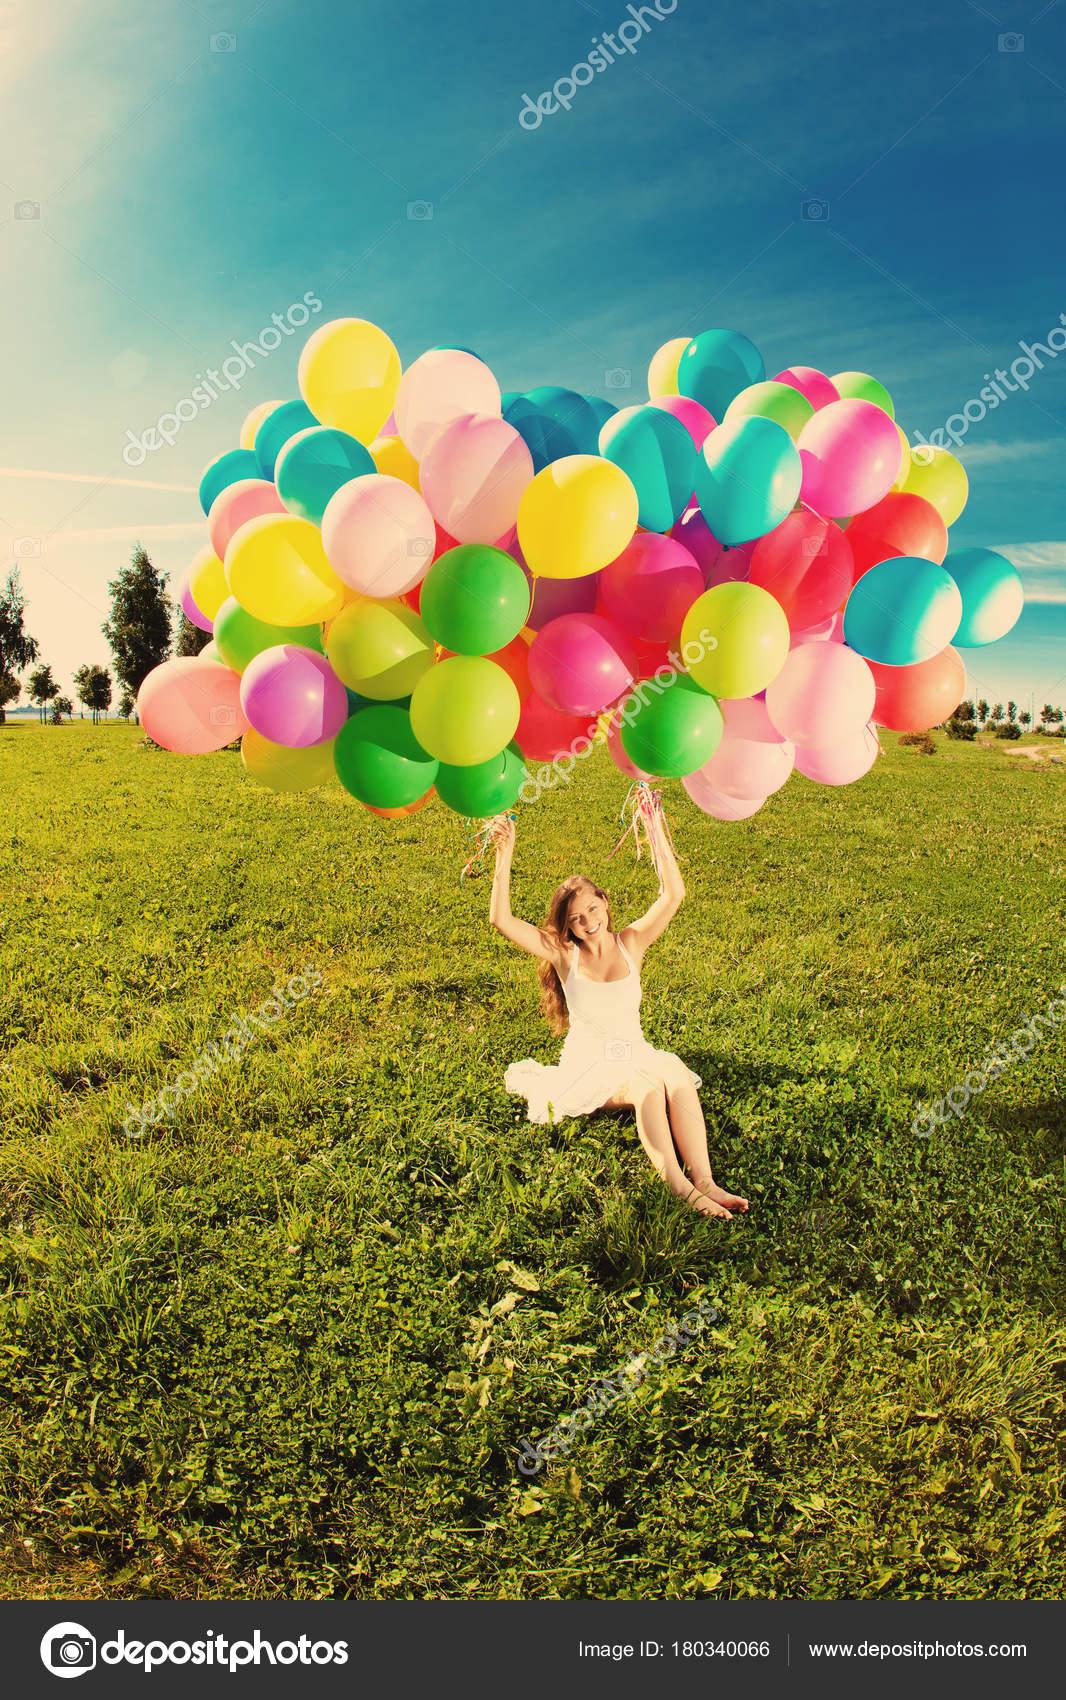 Happy Birthday Woman Sky Rainbow Colored Air Balloons Hands Sunny Stock Photo